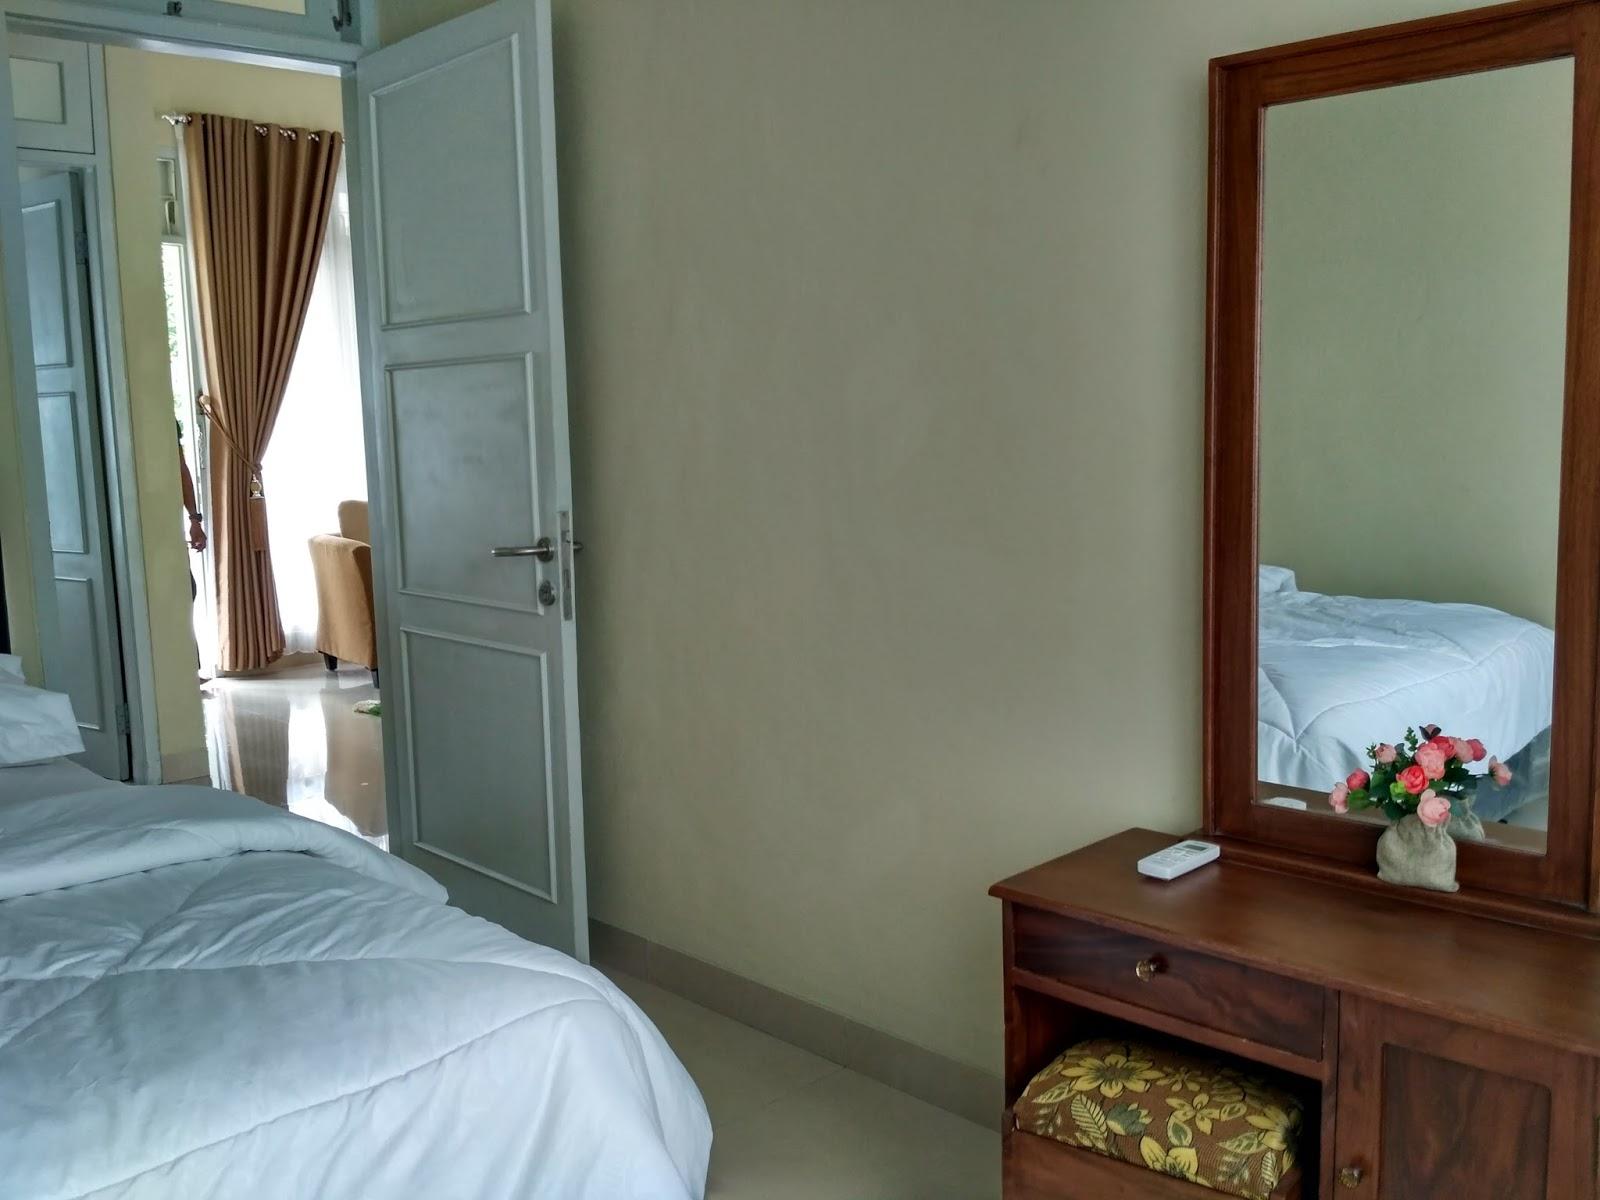 Harga Rp 600 Ribu Maximal 8 Orang Tanpa Extra Bed